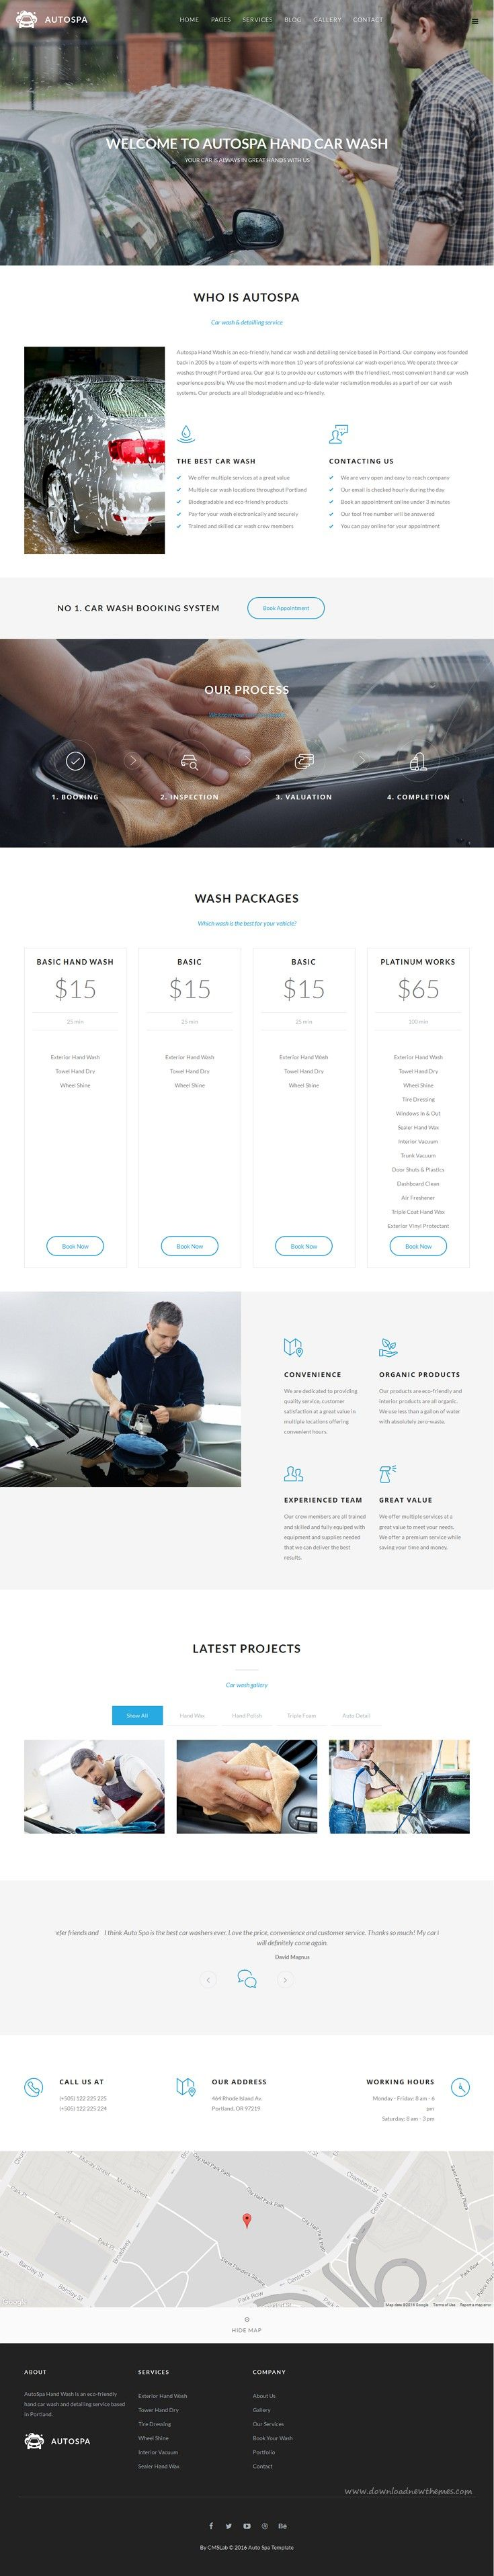 Design car repair workshop - 25 Best Ideas About Car Repair Shops On Pinterest Automobile Repair Shop Diy Auto Repair And Car Repair Near Me